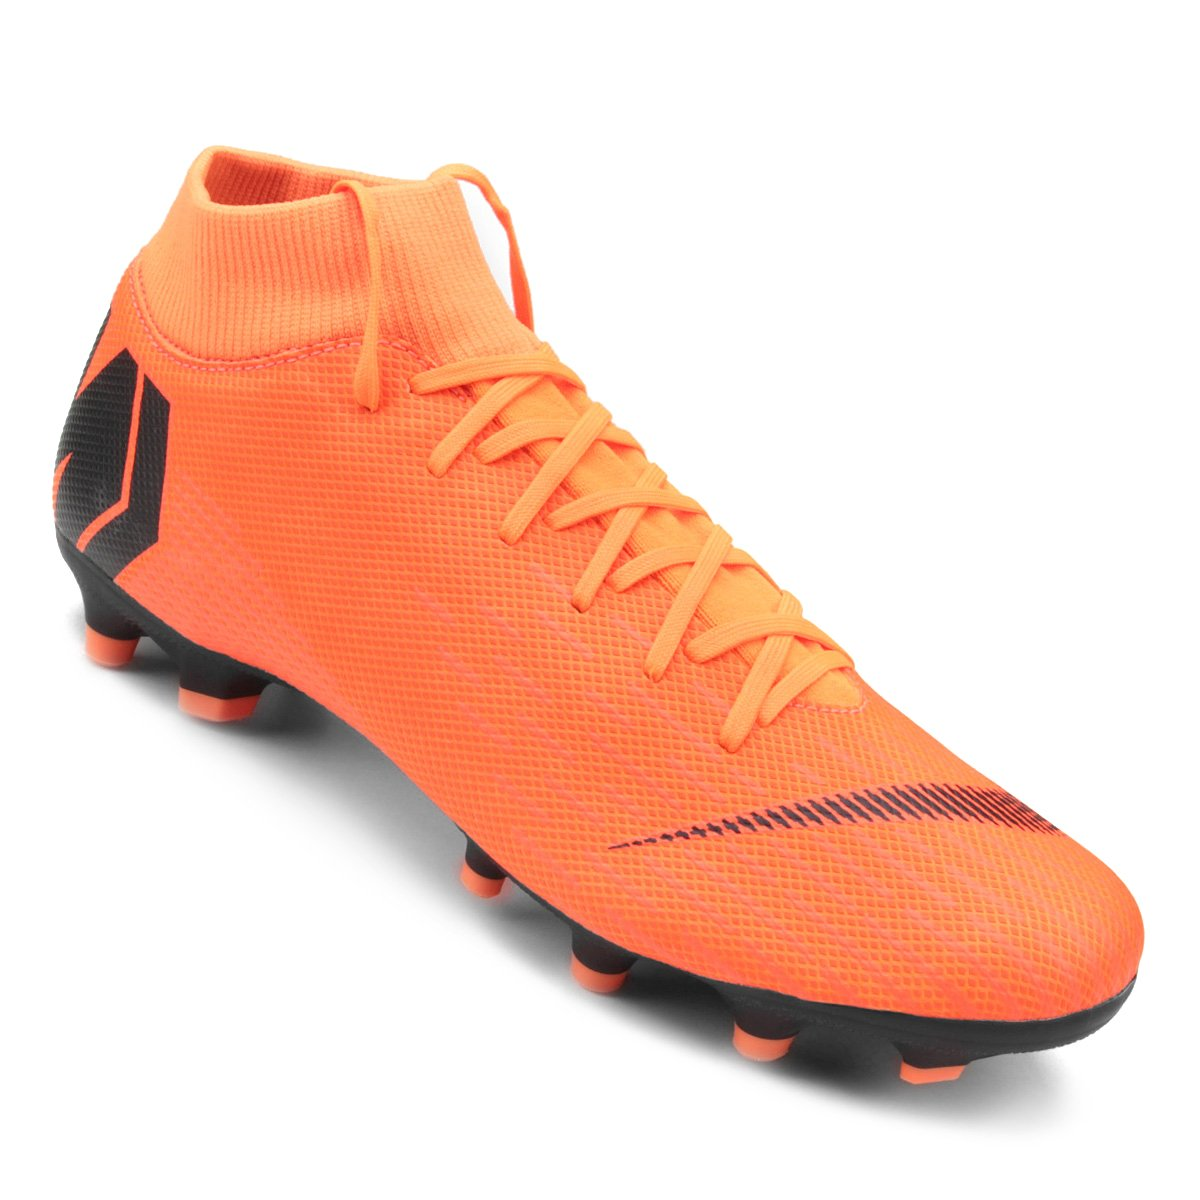 Chuteira Campo Nike Mercurial Superfly 6 Academy - Laranja e Preto ... 945e6e0b2a3ef